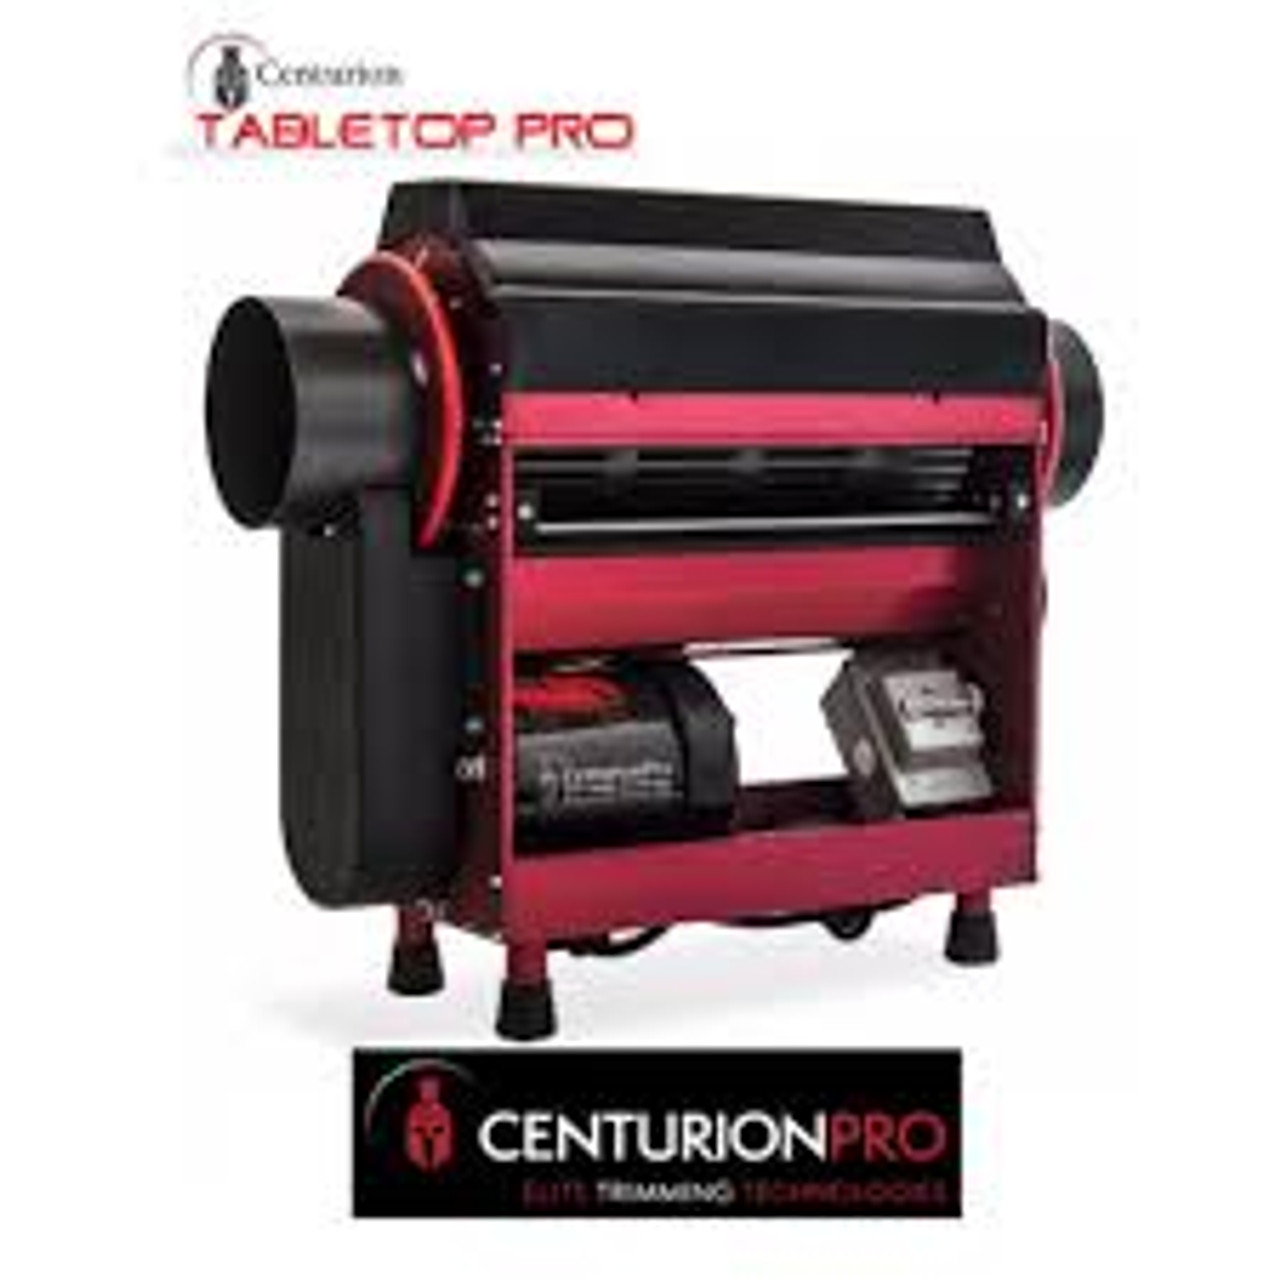 Centurion Table Top